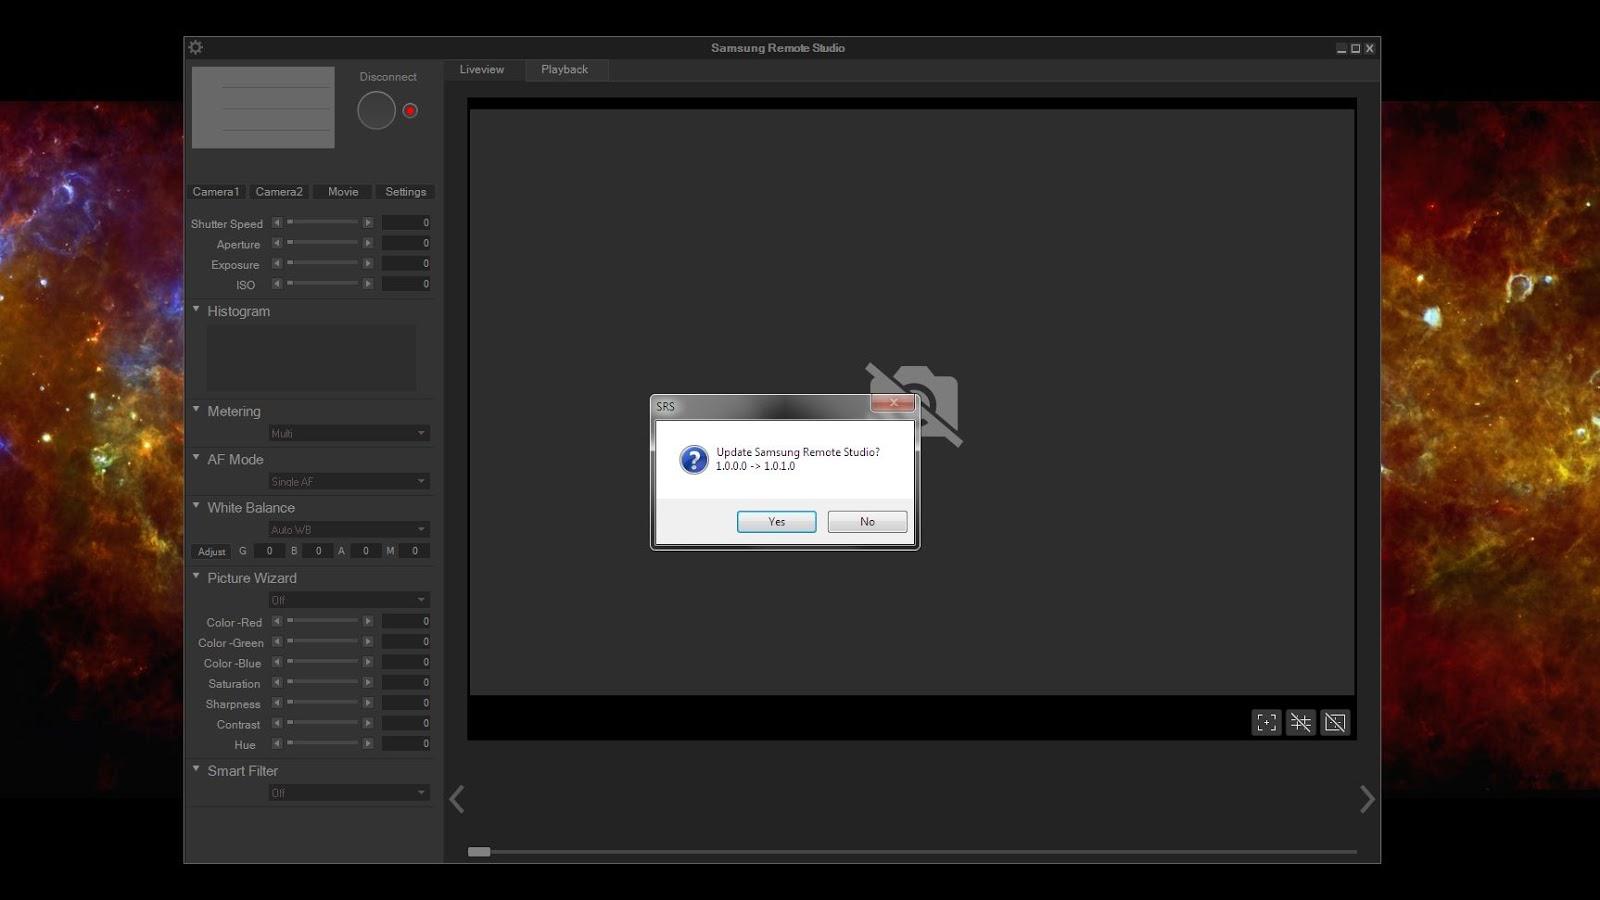 ESGI Media: Update! - Samsung NX1 Remote Studio to v1 0 1 0